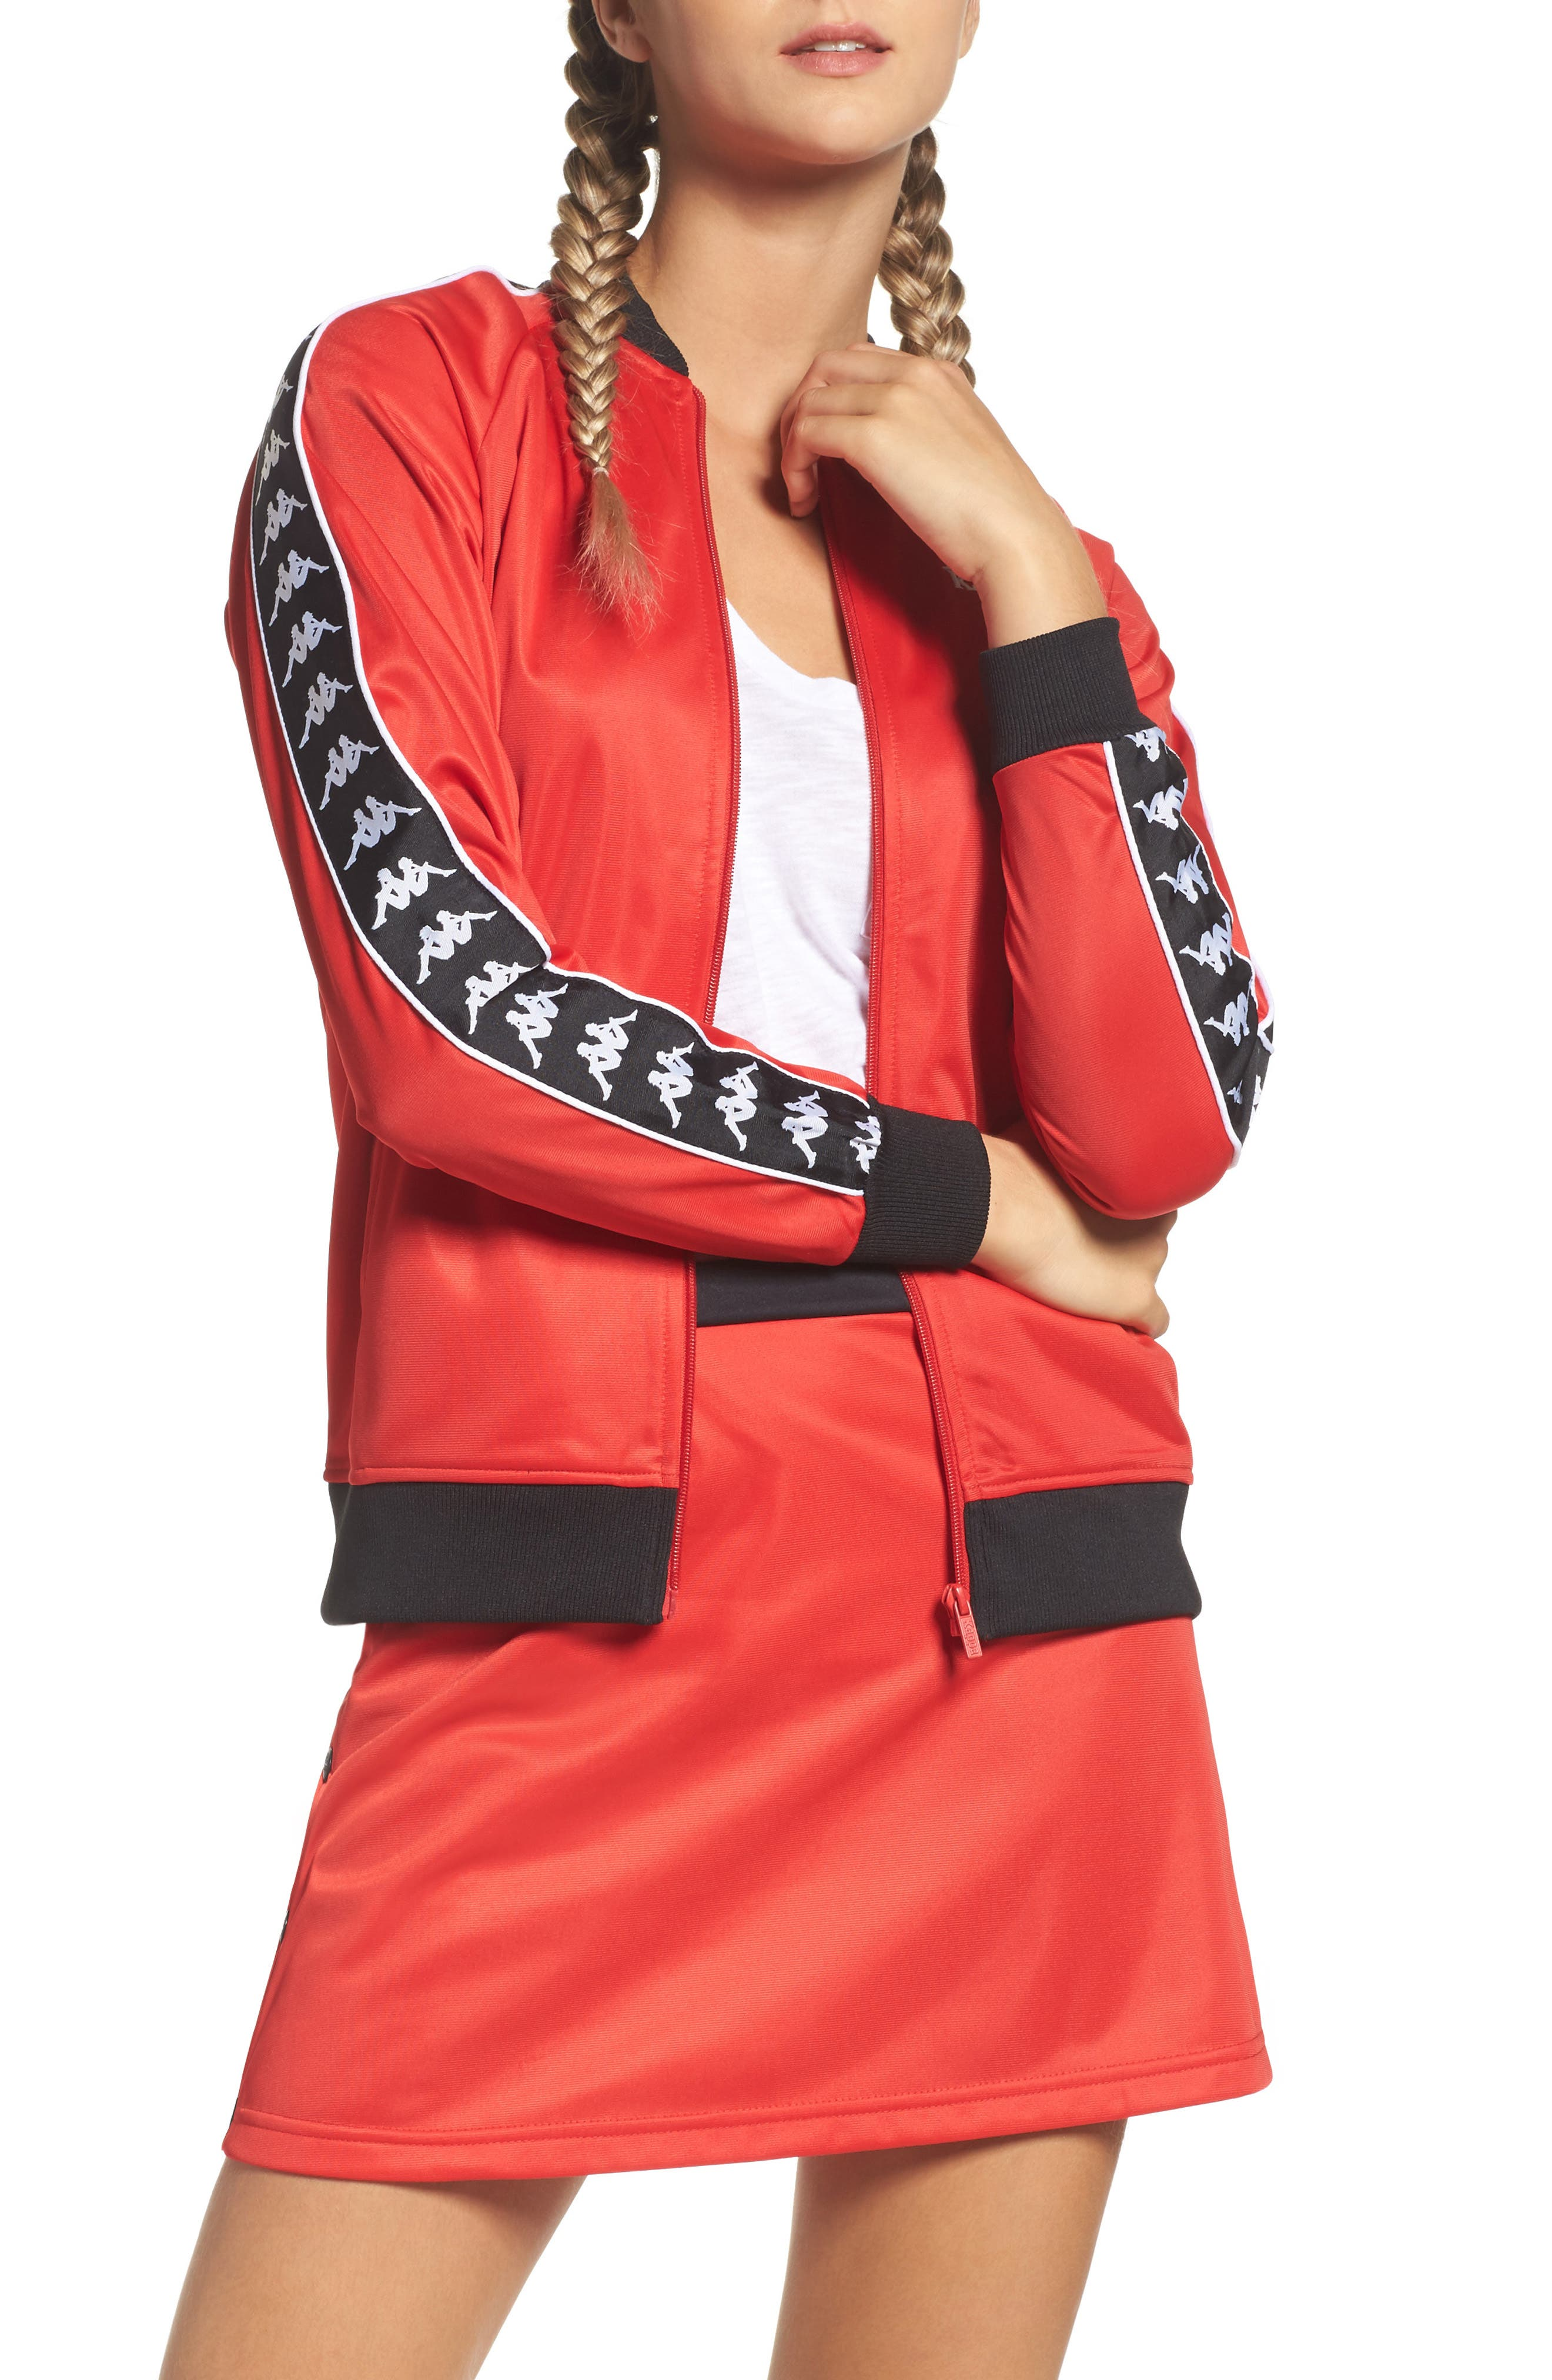 Kappa Authentic Morecambe Track Jacket